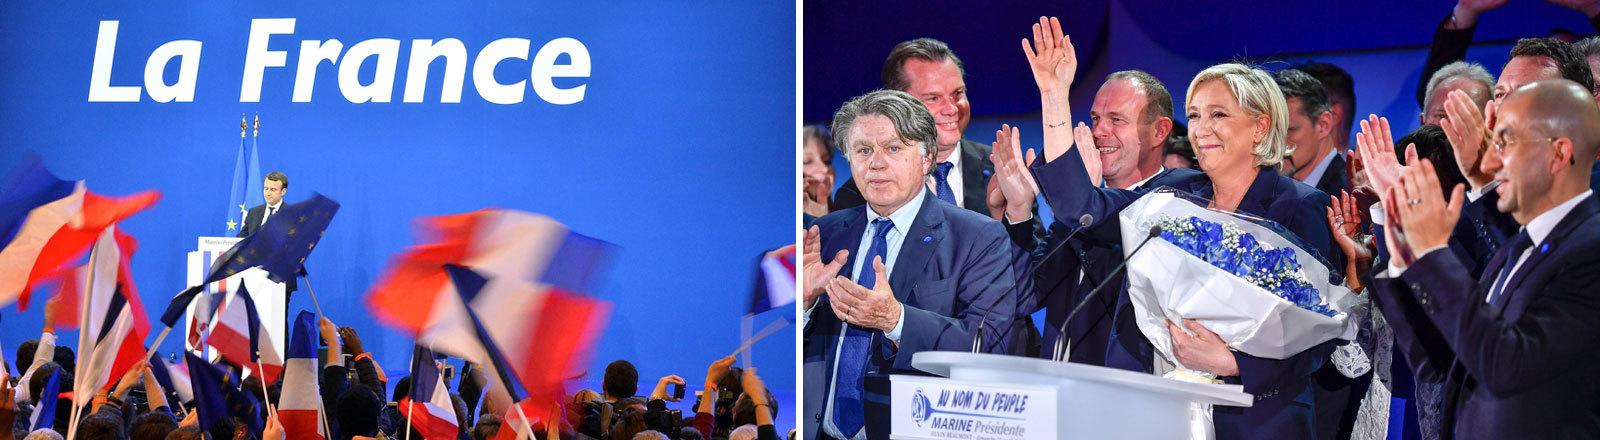 Macron und Le Pen, Collage DRadio Wissen